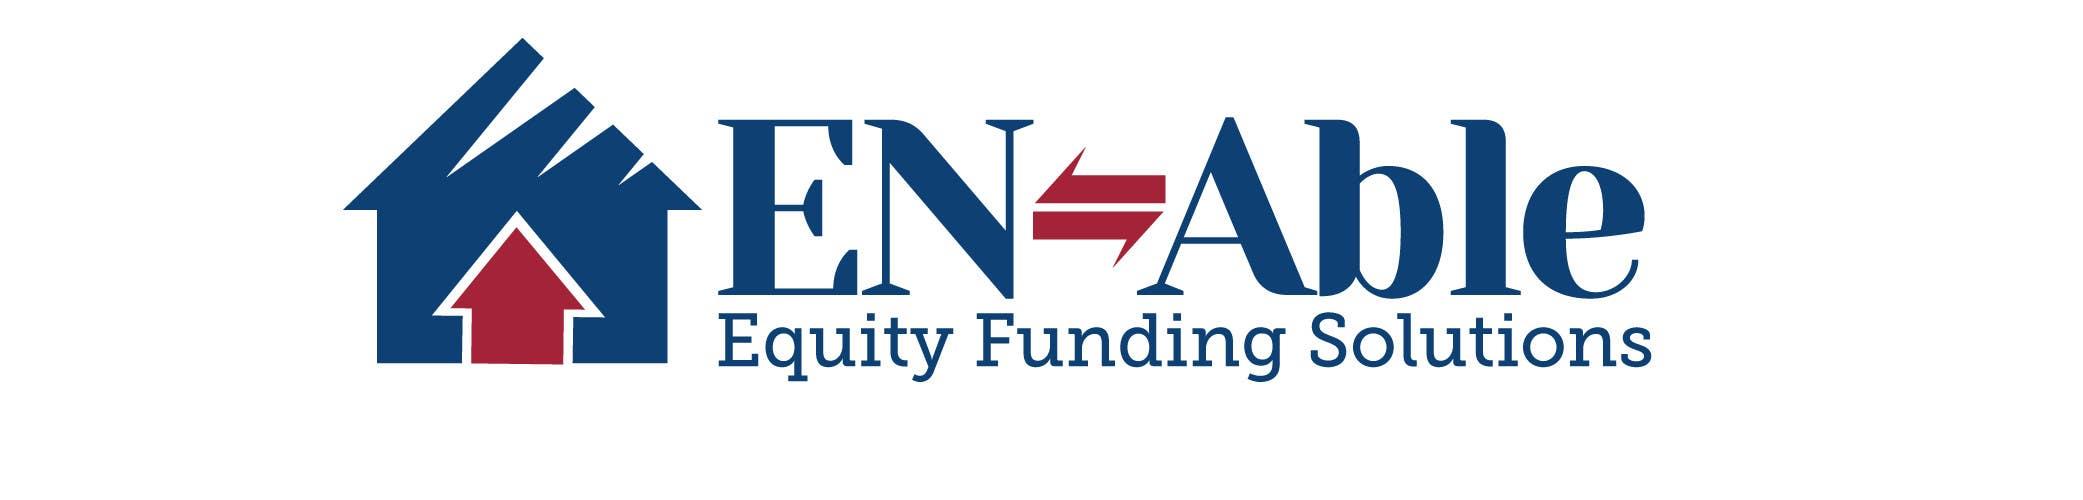 Penyertaan Peraduan #                                        1                                      untuk                                         Design a Logo for EN-Able Equity Funding Solutions (Pty) Ltd